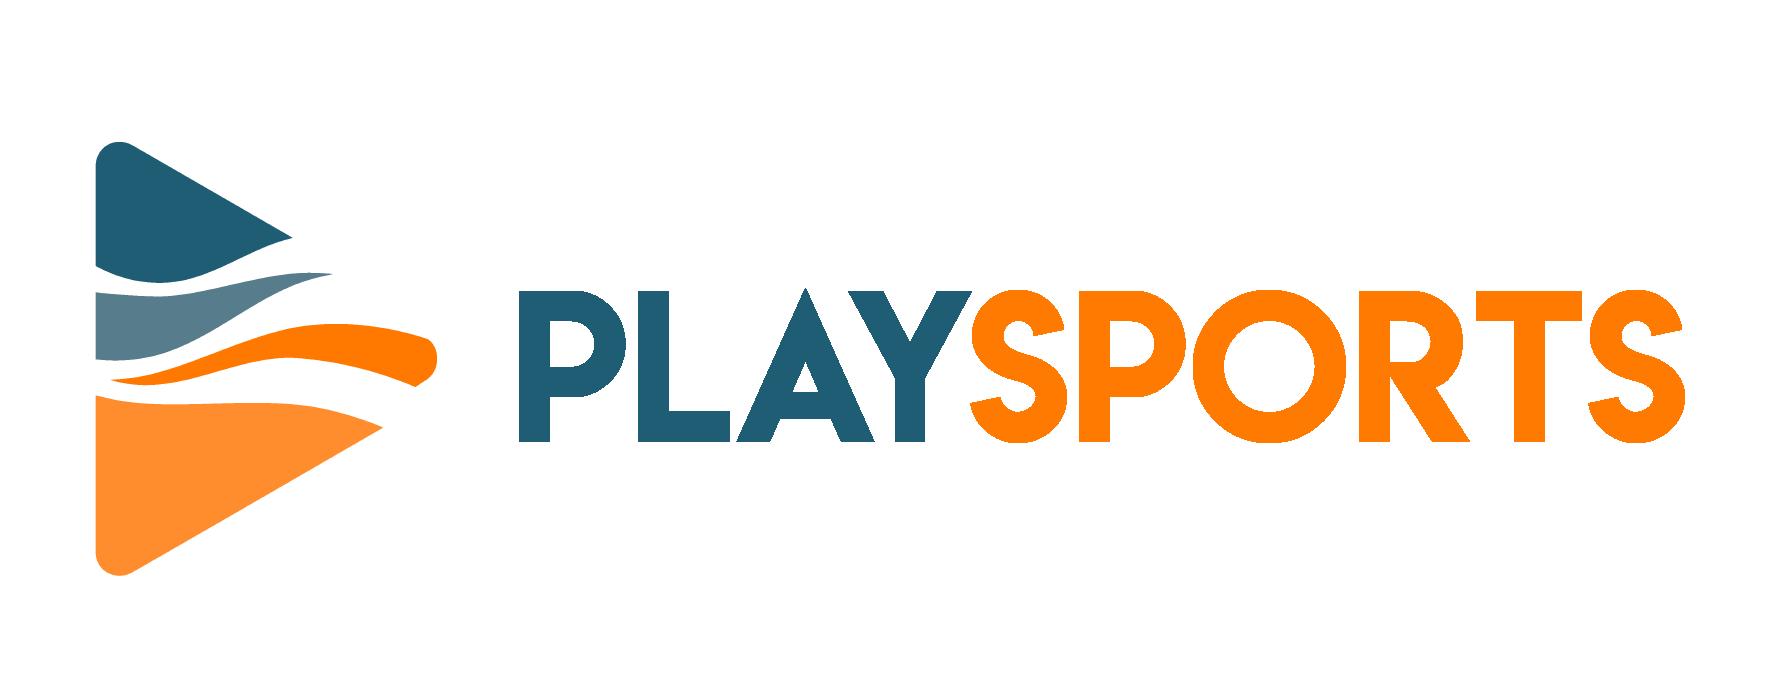 Store Playsports